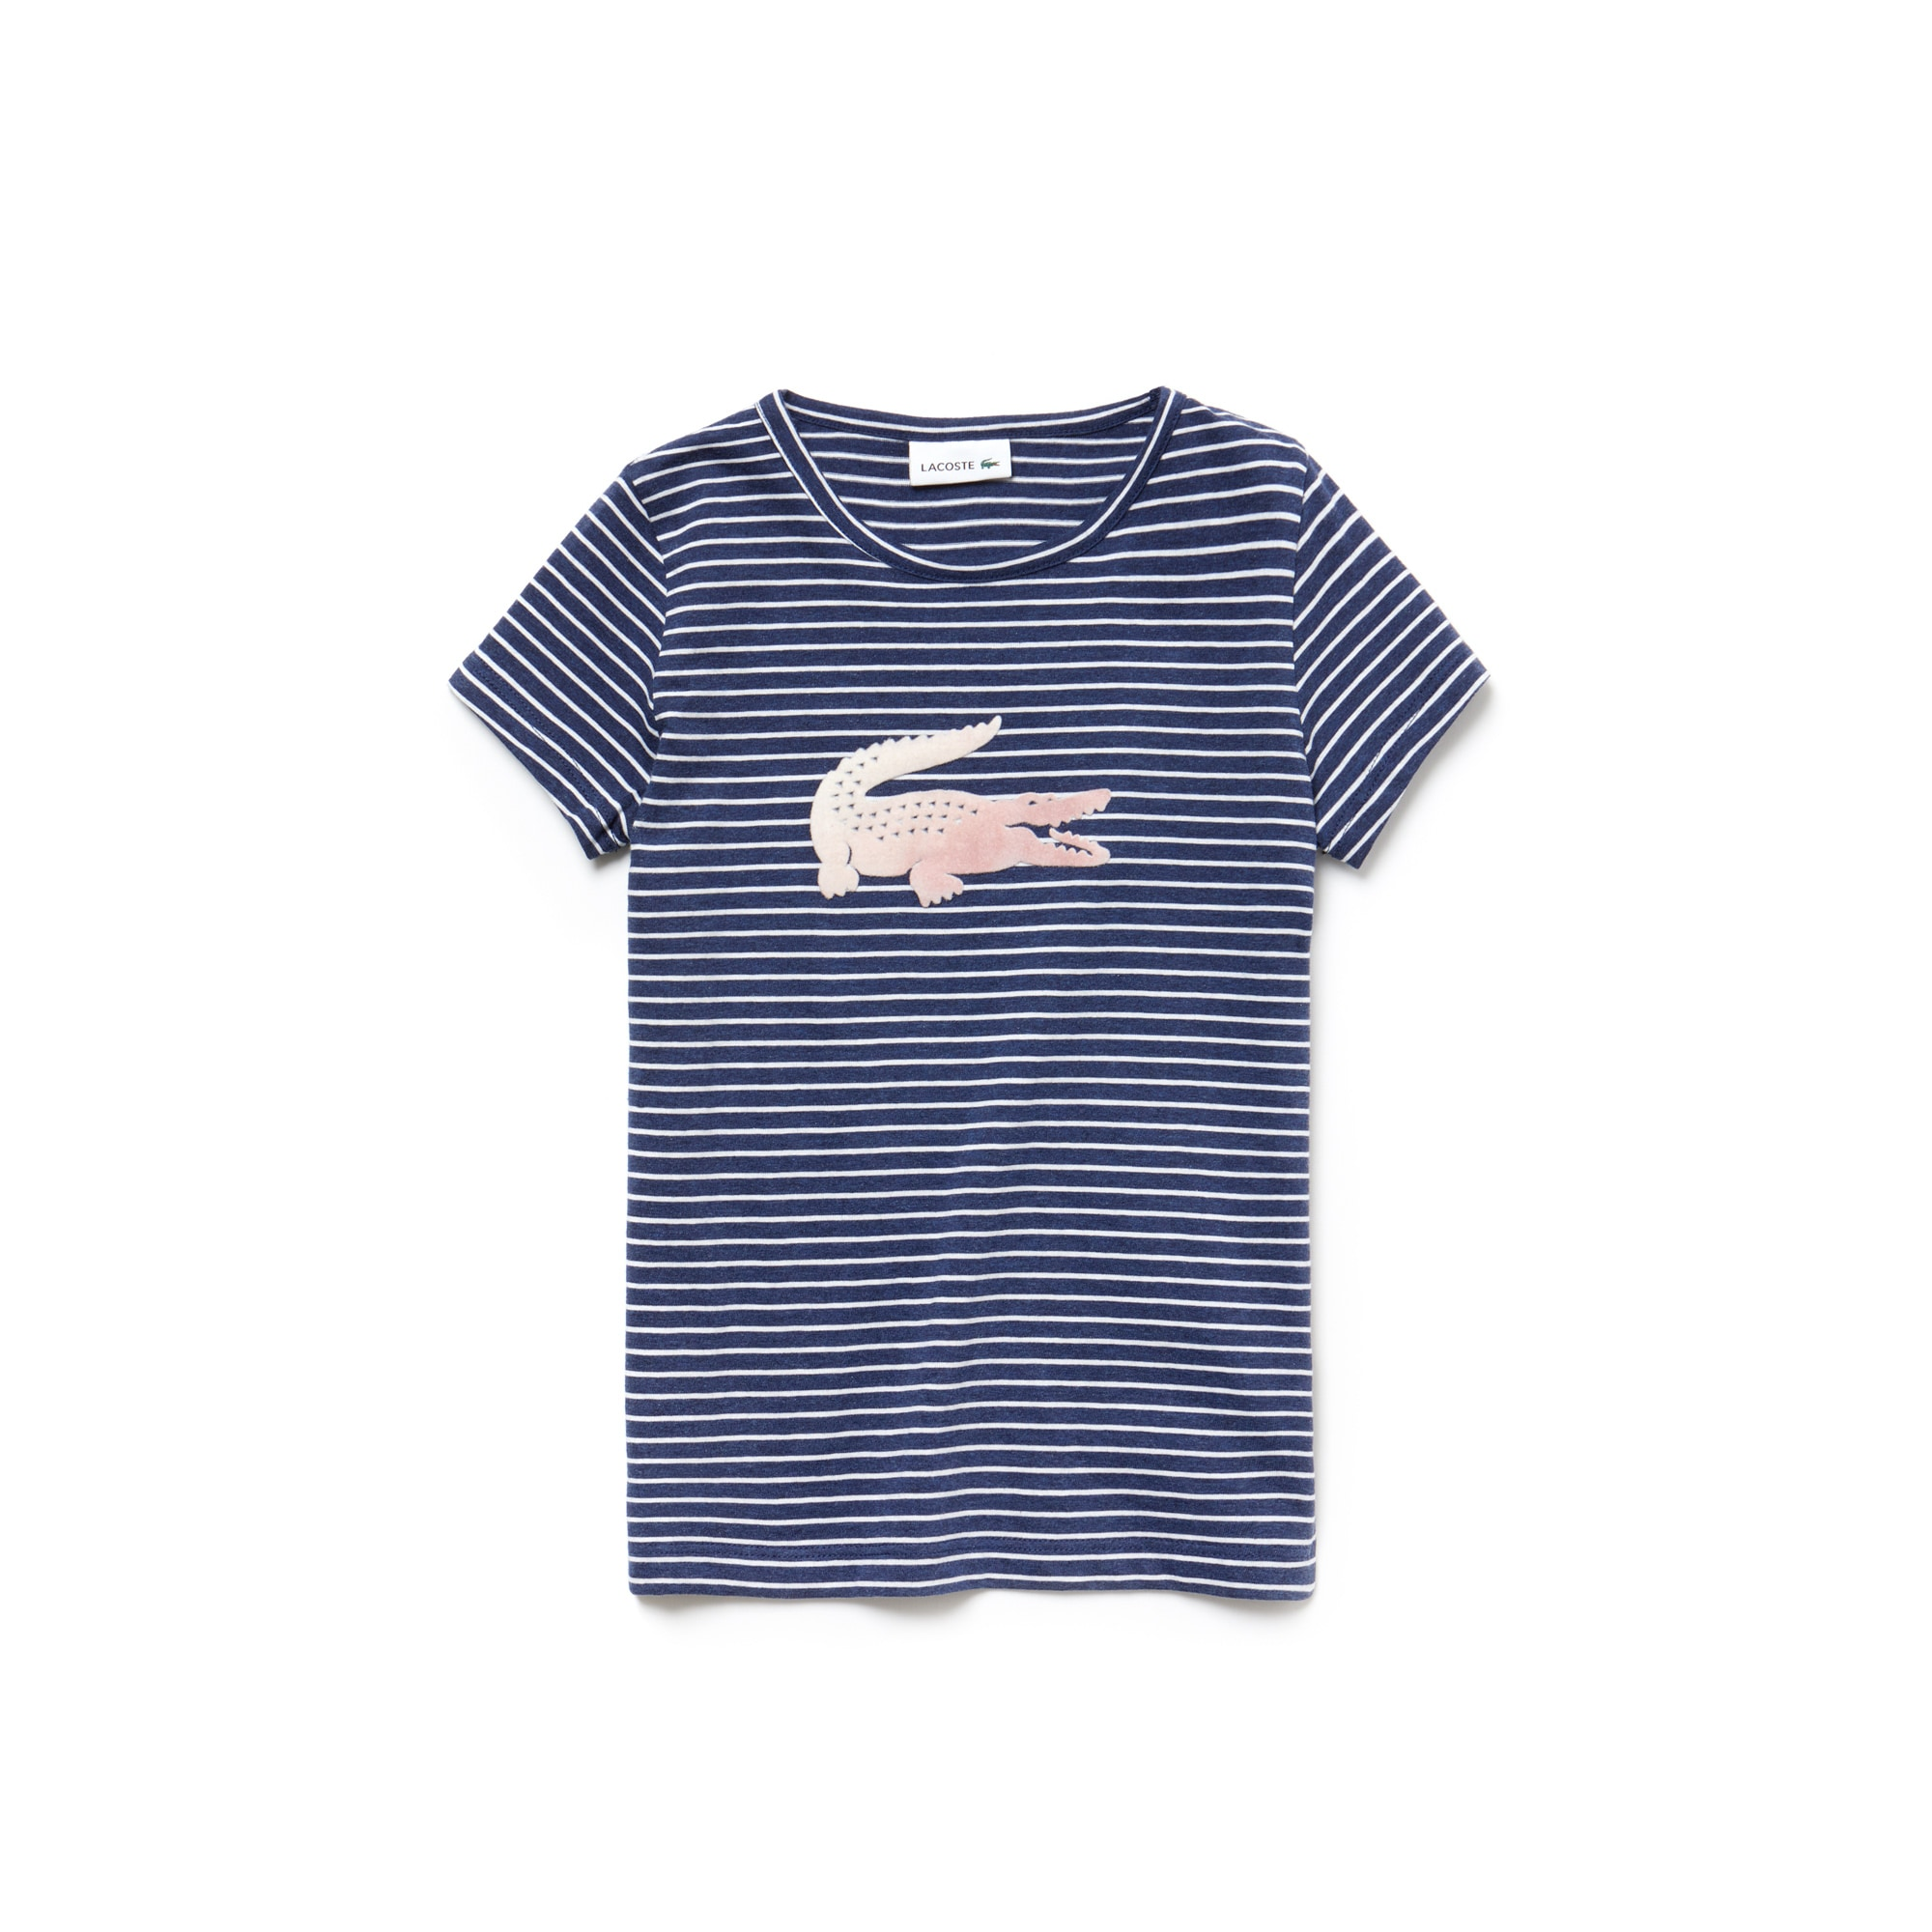 Girls' Crew Neck Oversized Crocodile Striped Jersey T-shirt